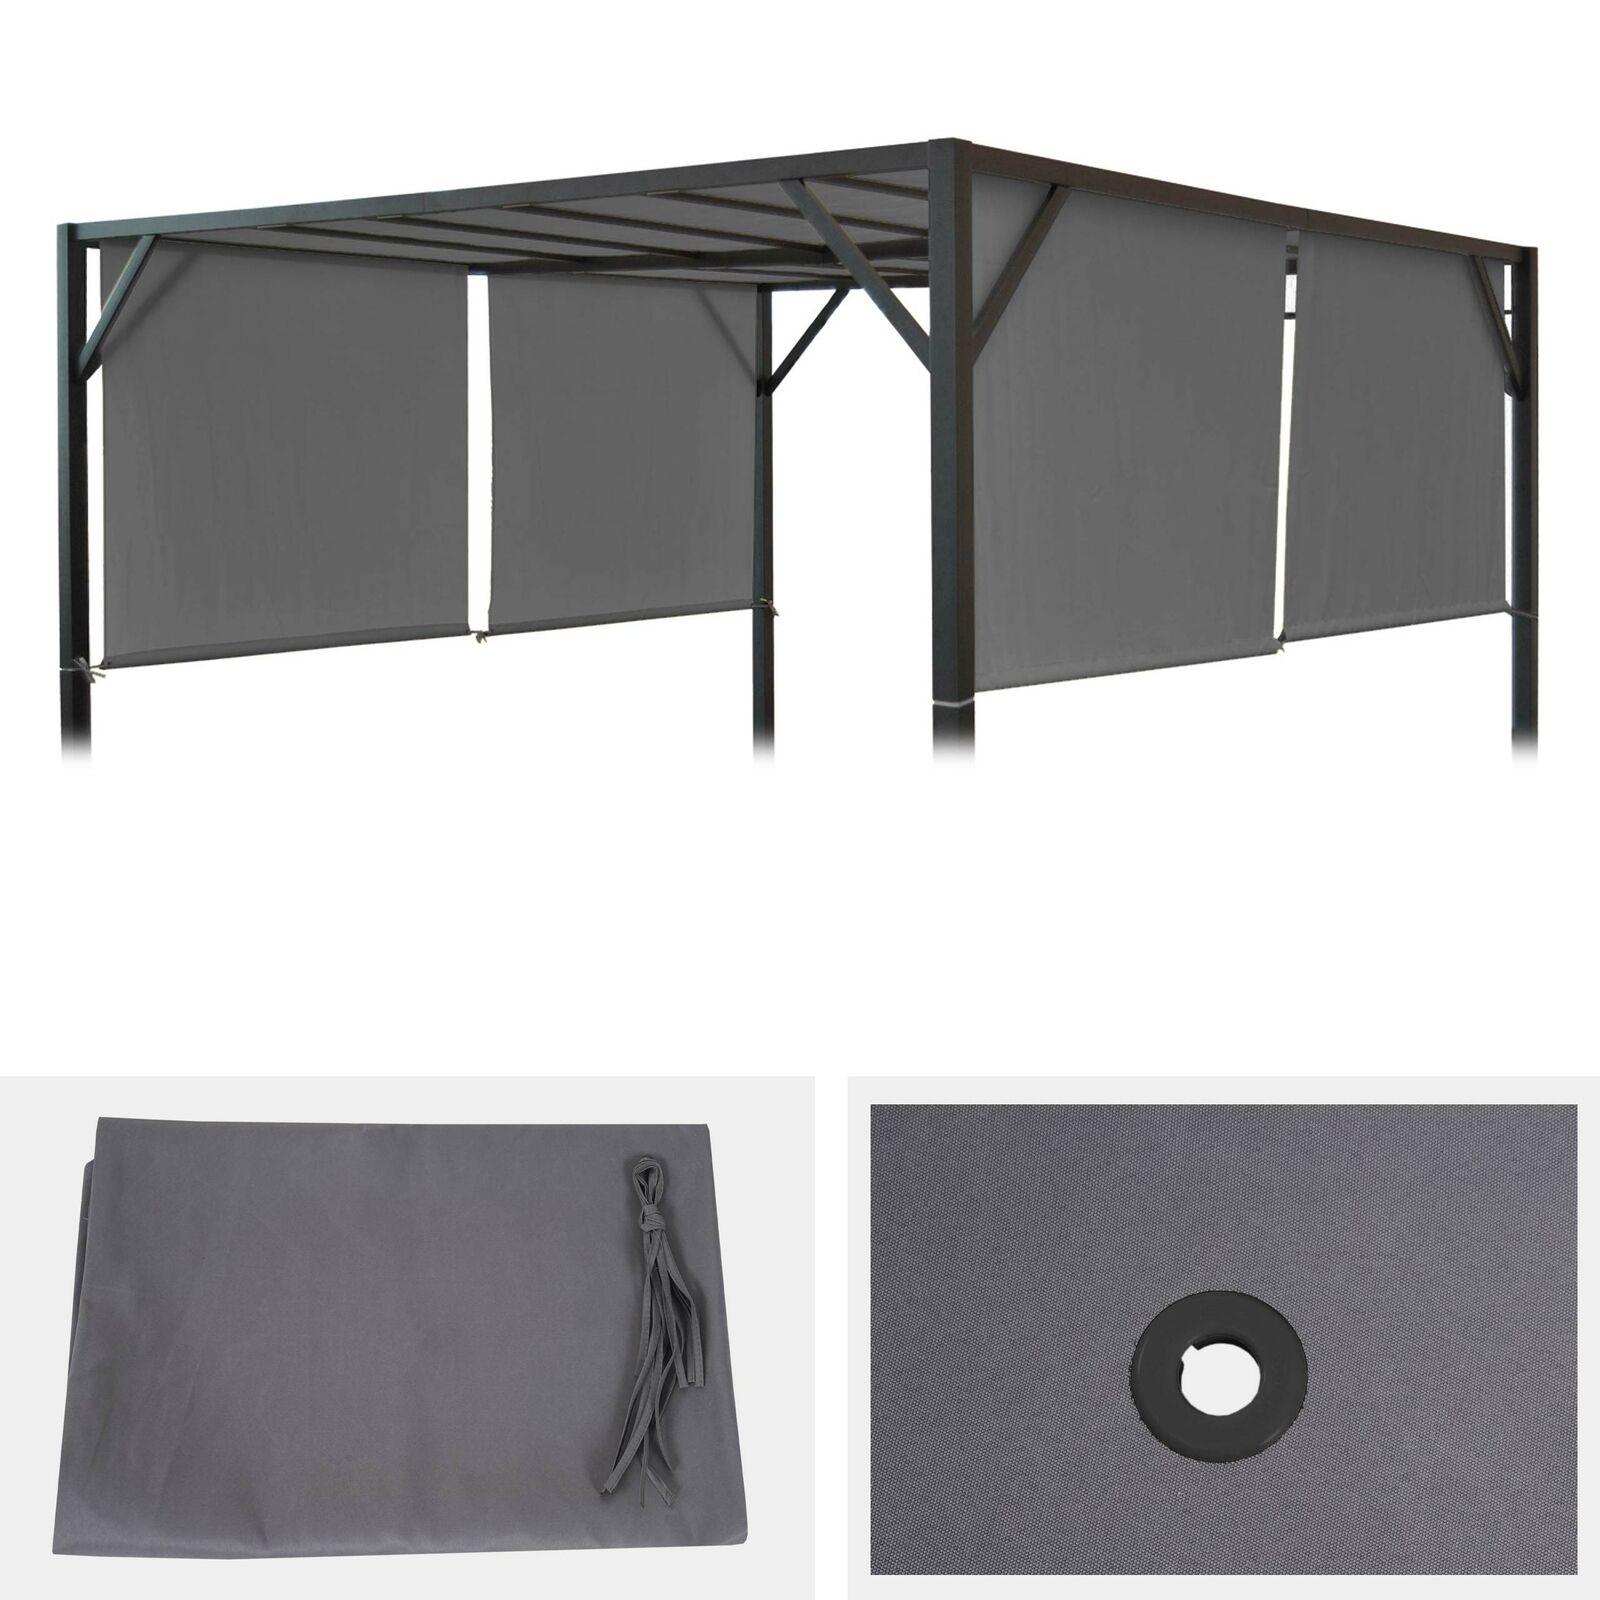 Funda de Repuesto para Techo Pérgola, Pabellón, Beja 4x4m, gris